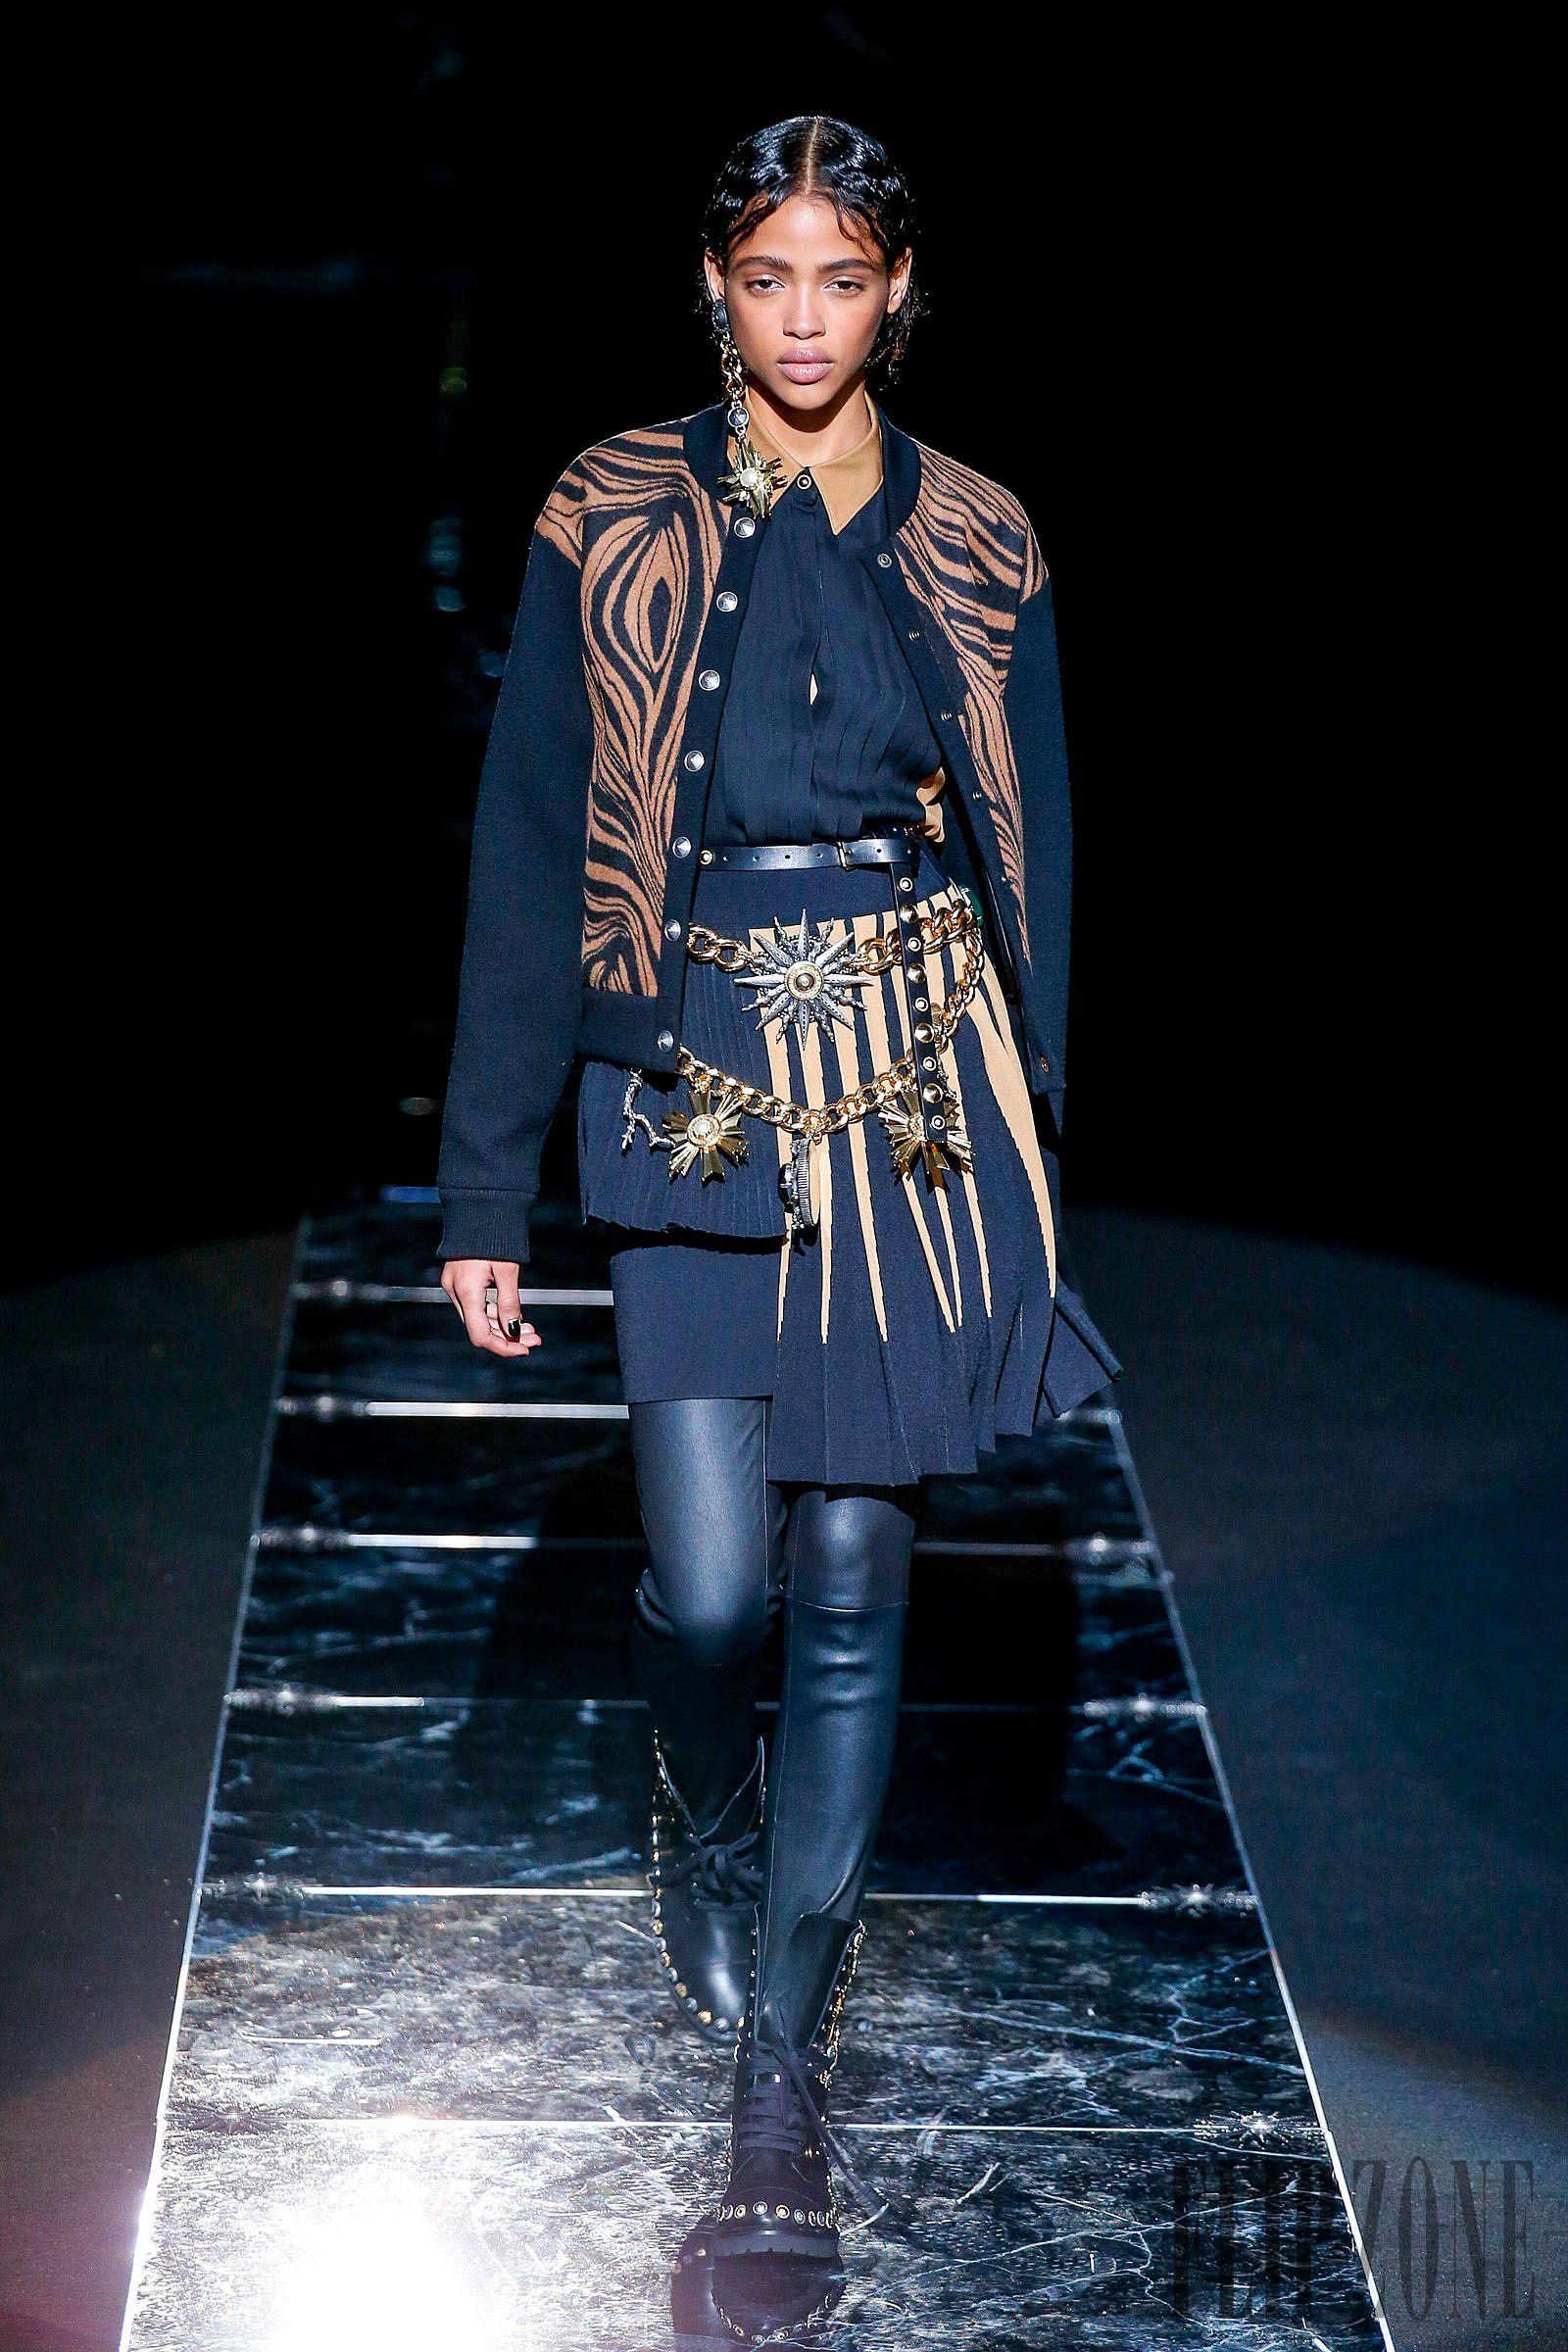 Farb-und Stilberatung mit www.farben-reich.com - Fausto Puglisi Fall-winter 2015-2016 - Ready-to-Wear